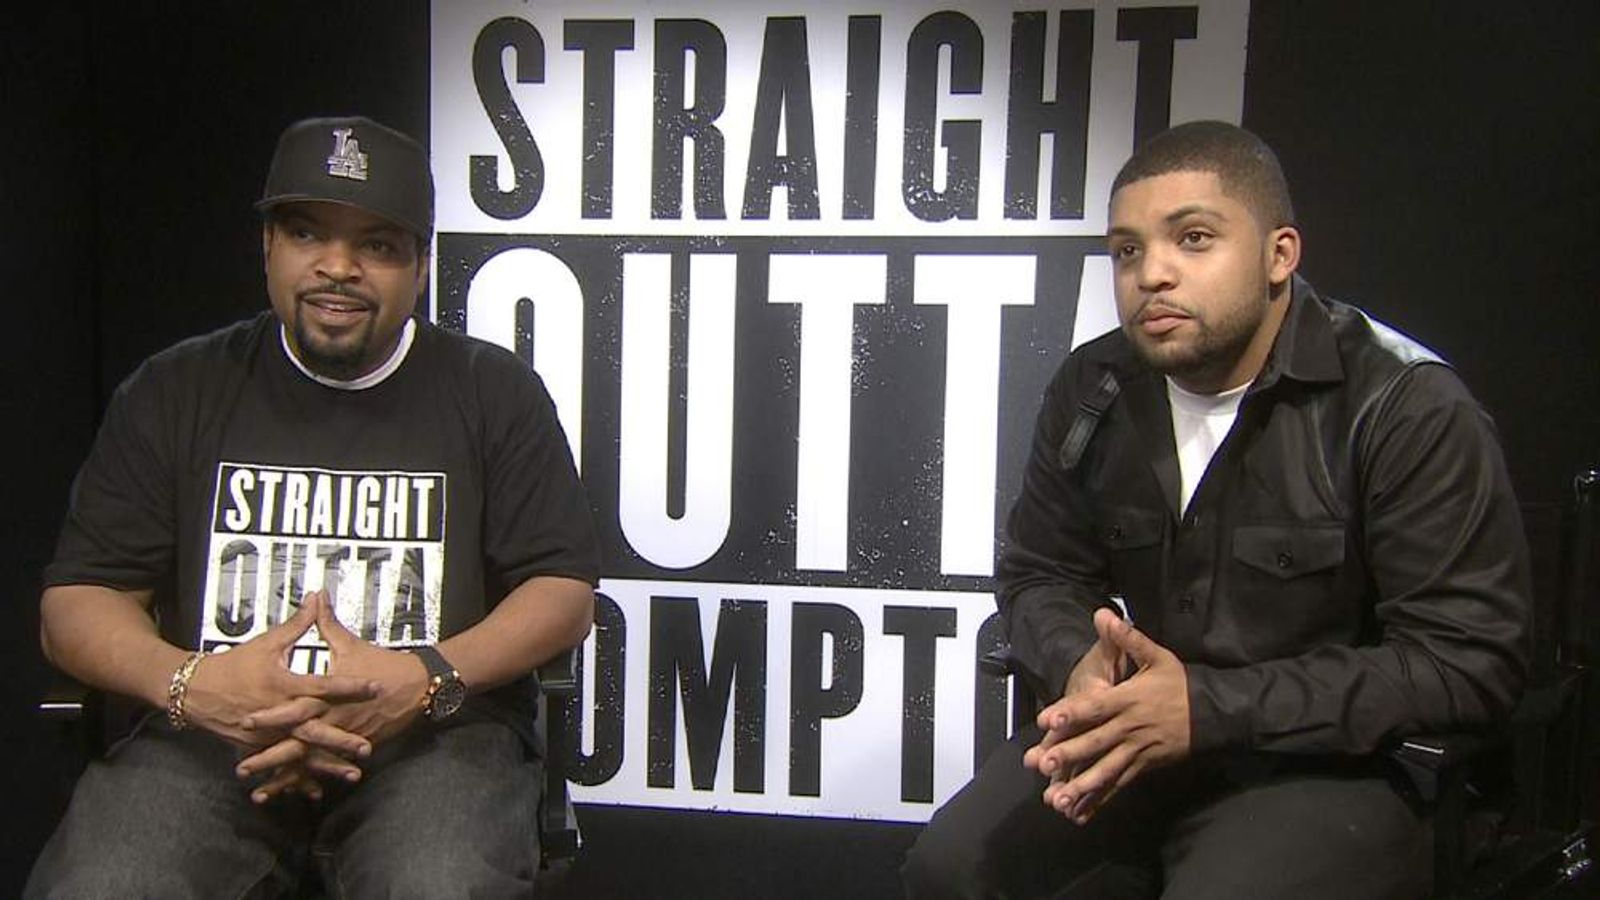 Ice Cube and O'Shea Jackson Jr